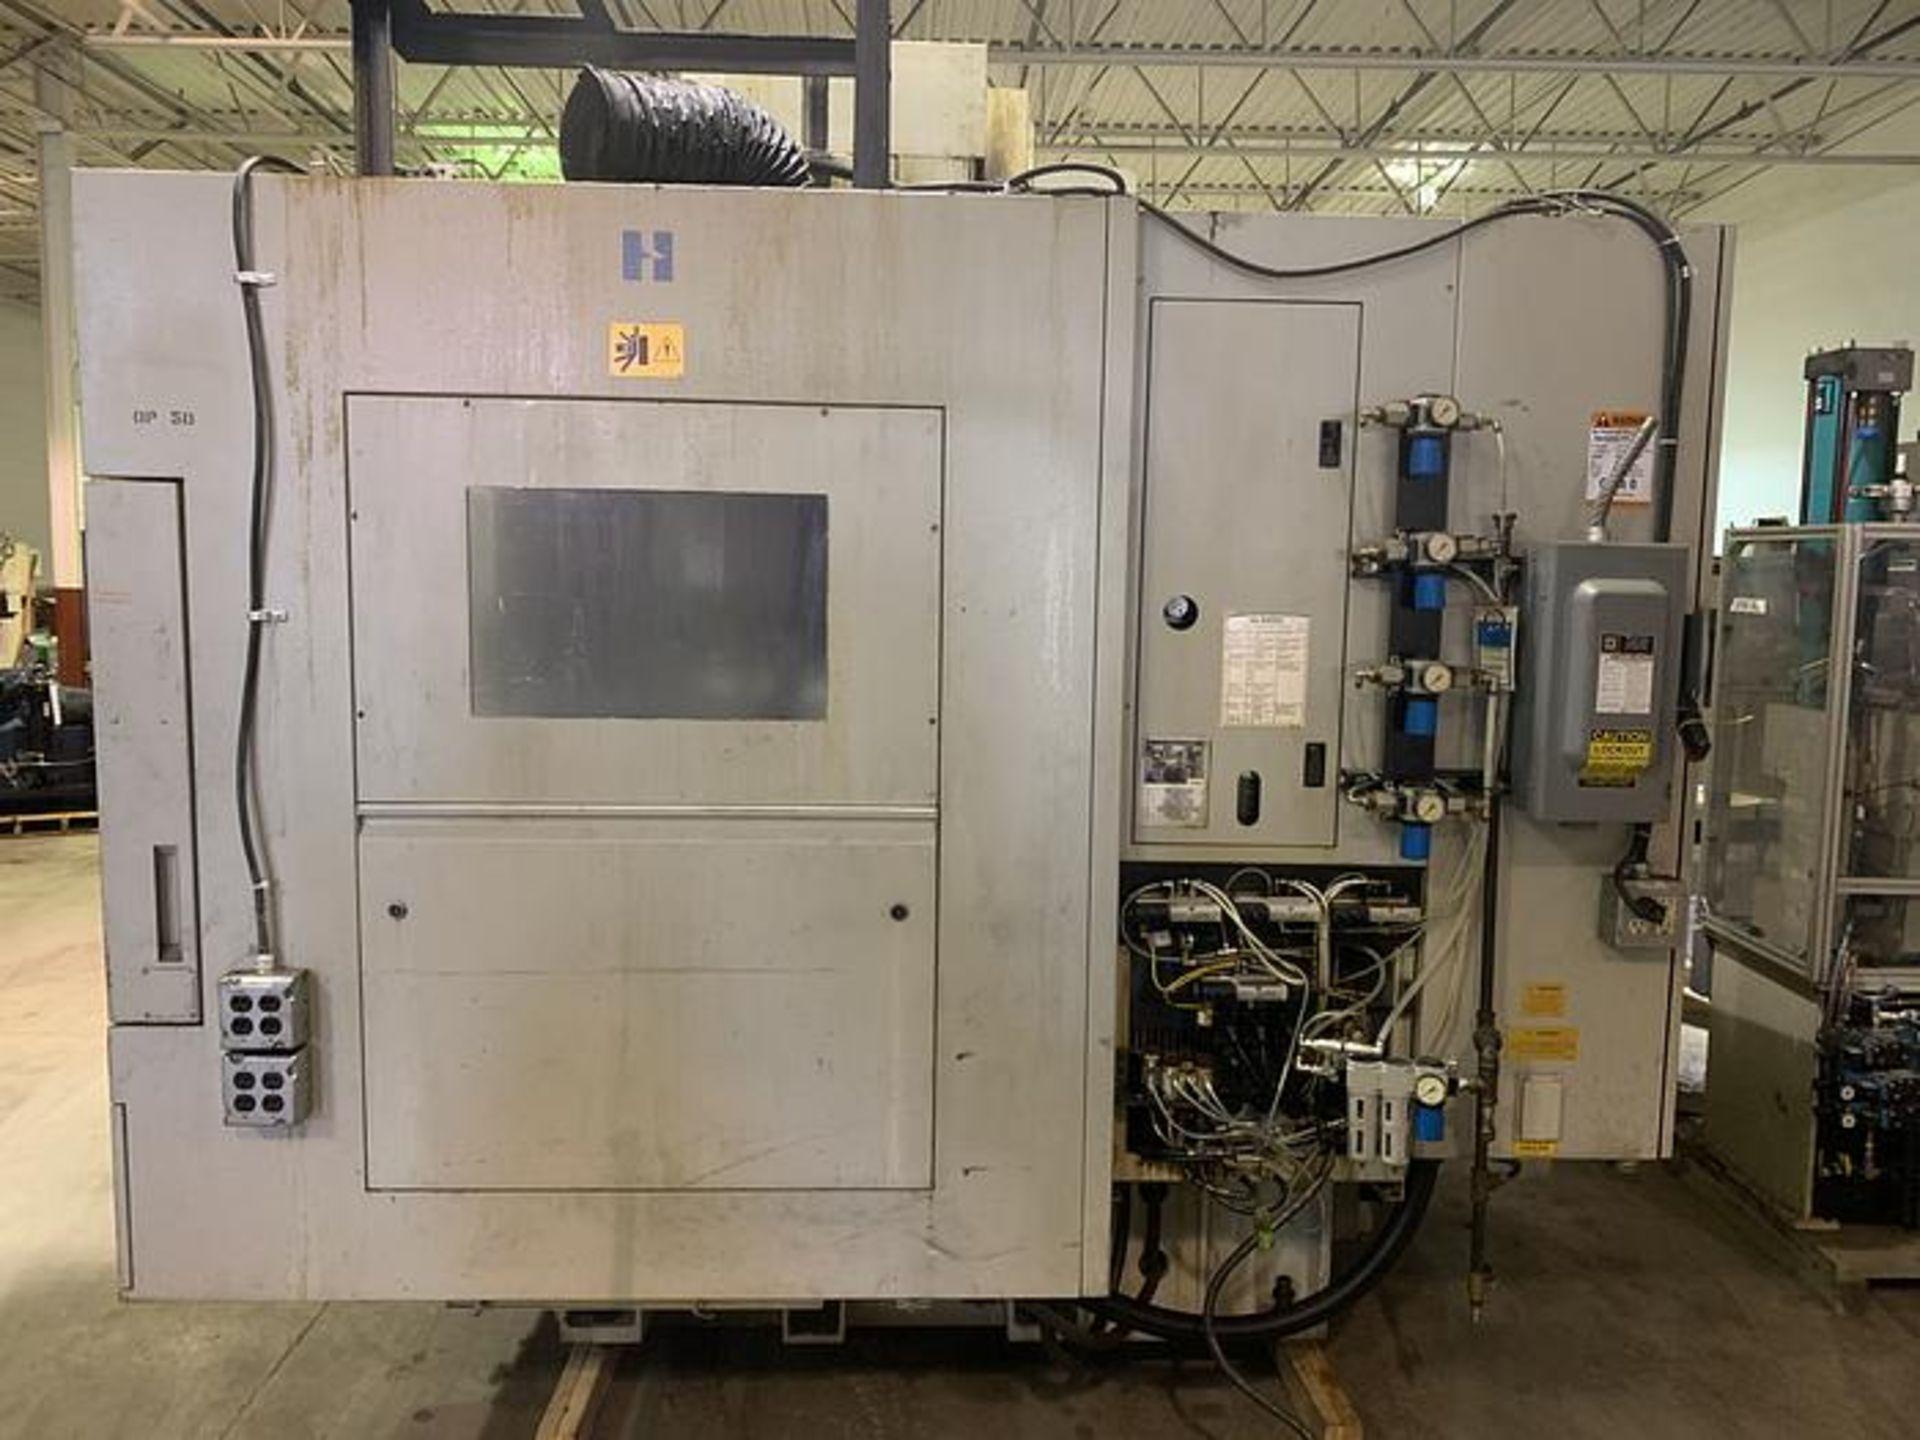 "HARDINGE XR760 CNC VMC PRODUCTION CENTER 30""X24""X24"", YEAR 2010, SN XRAB0A0001 - Image 6 of 12"